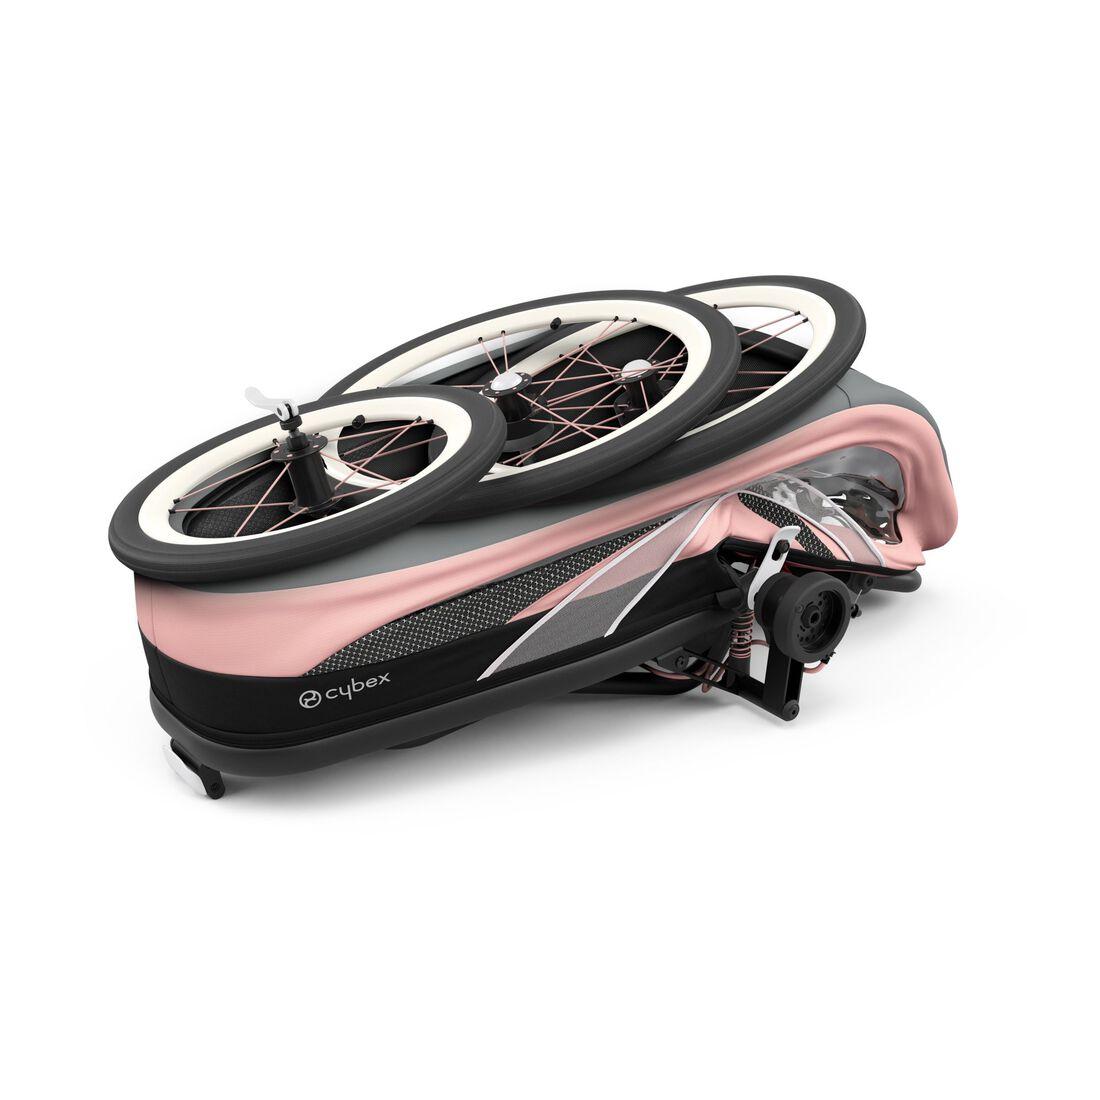 CYBEX Zeno Sitzpaket - Silver Pink in Silver Pink large Bild 6